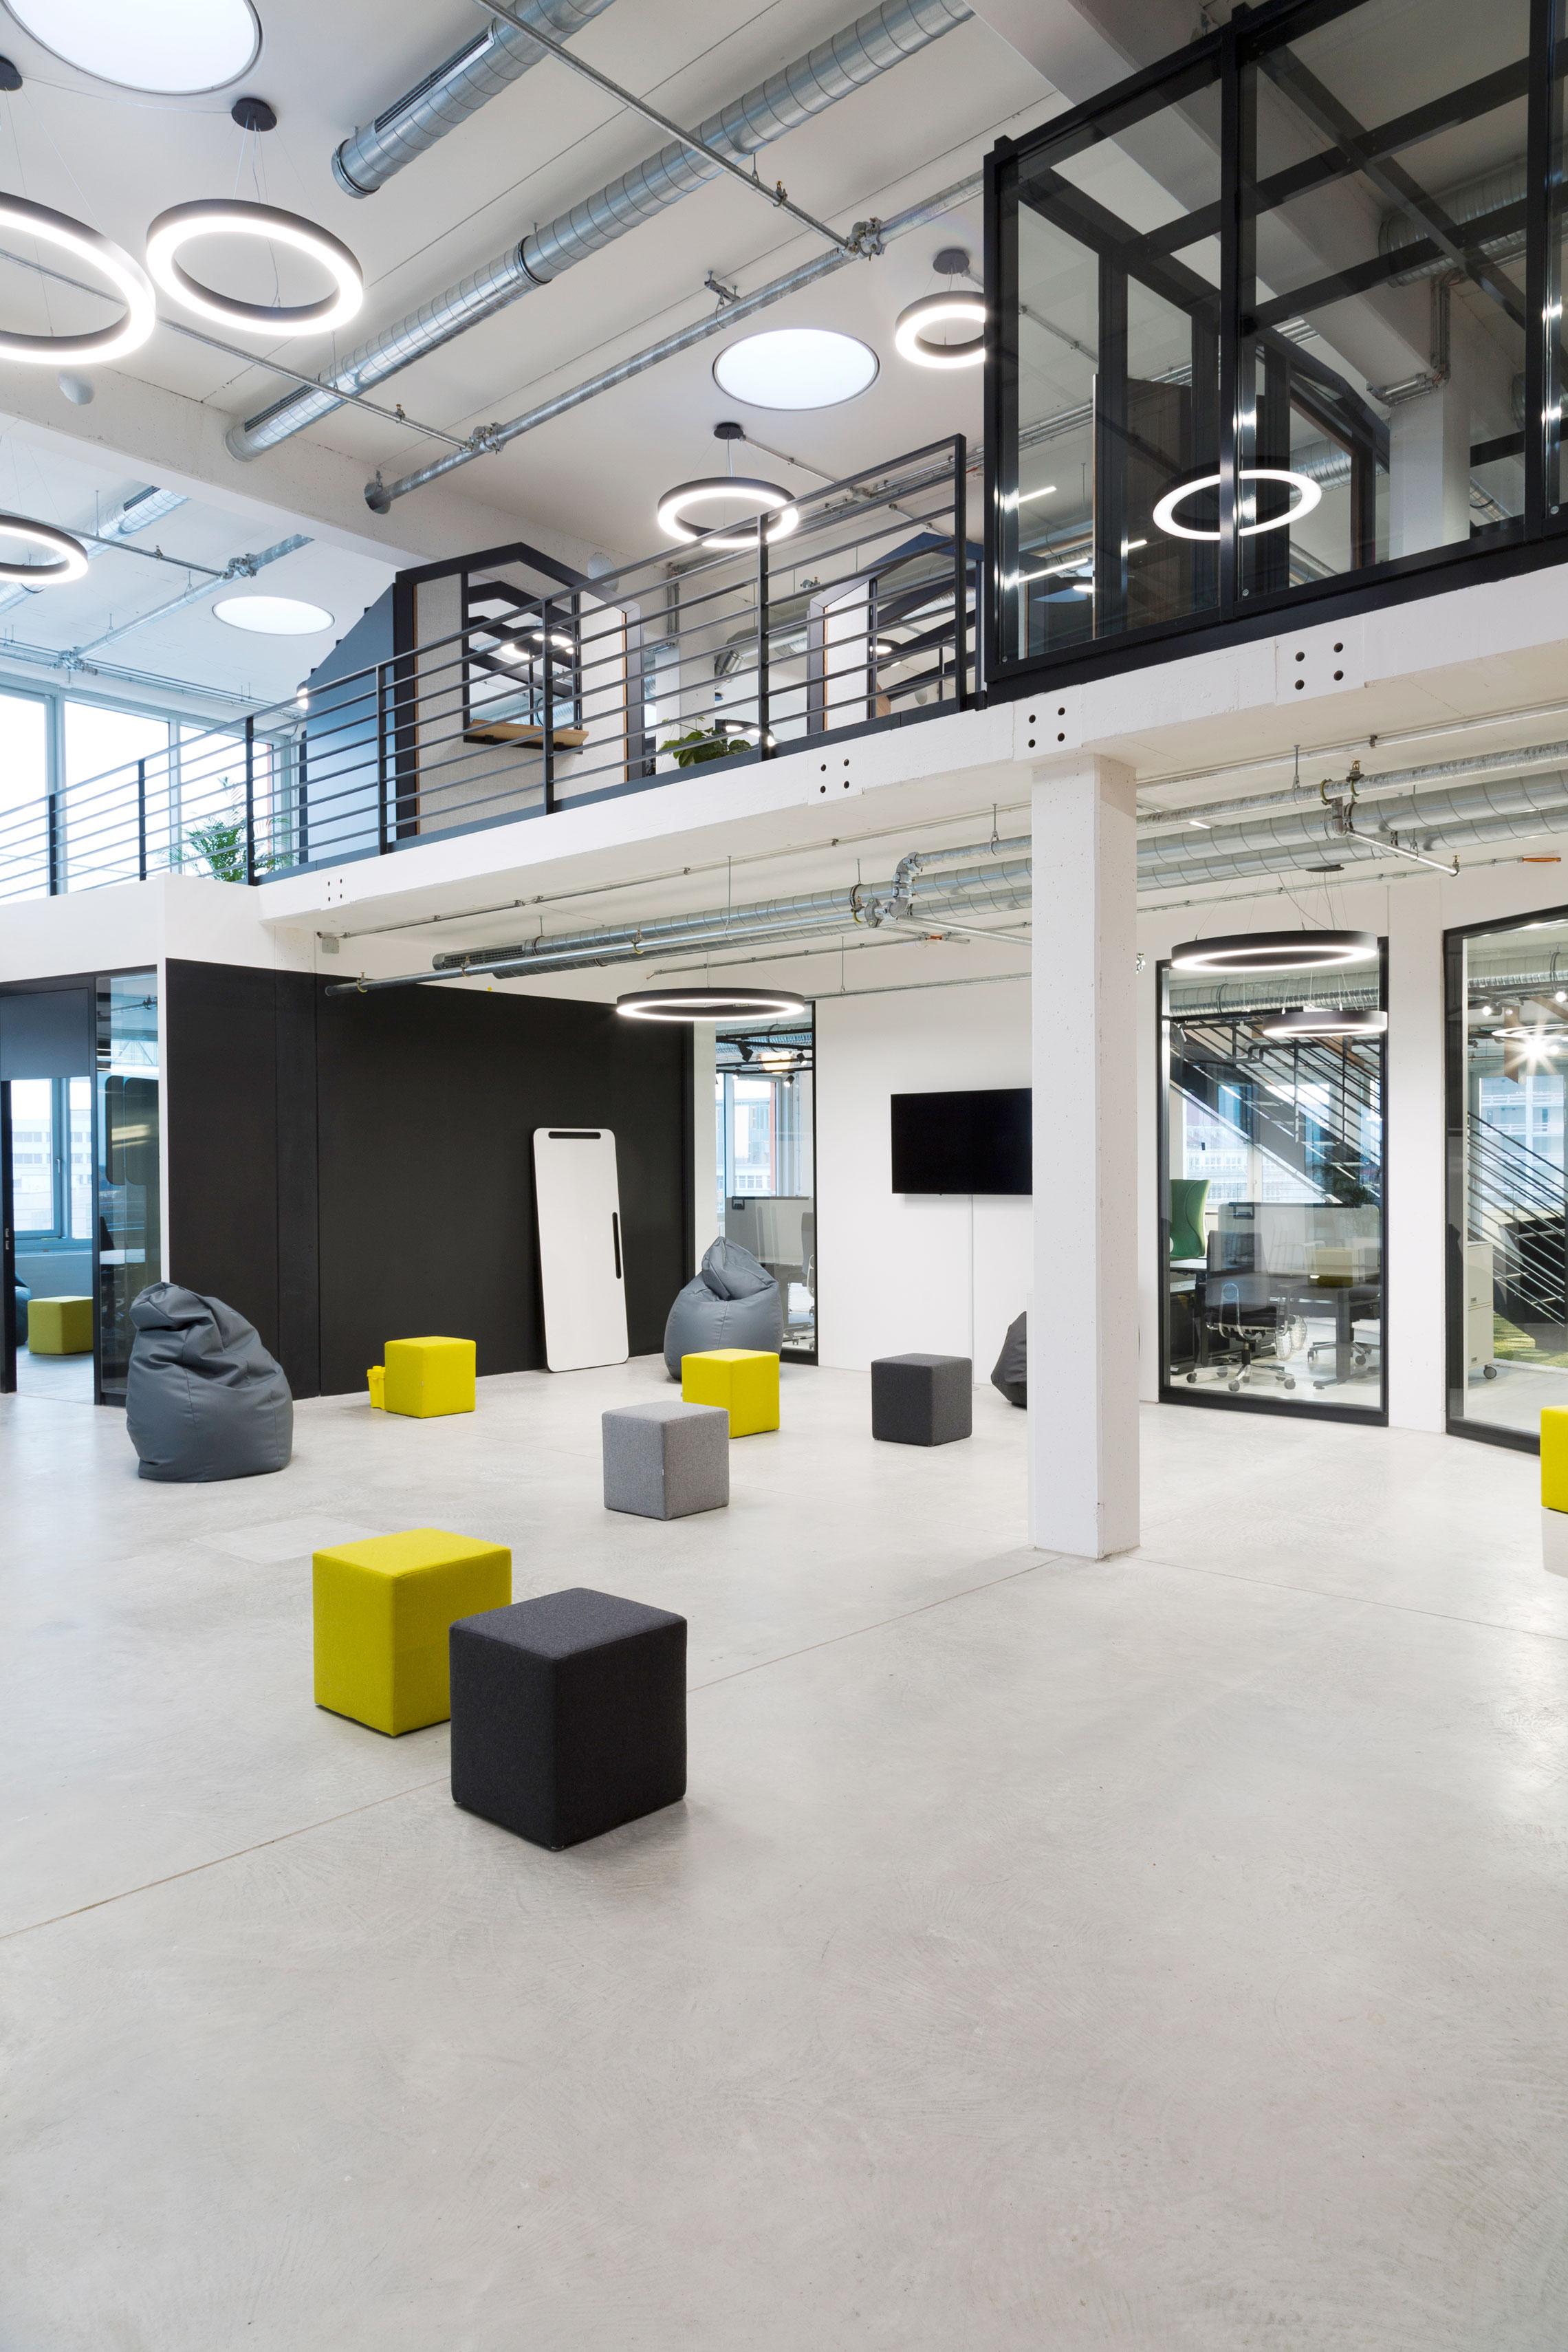 16 Allianz Global Digital Factory, Entwurf und Planung conceptsued gmbh (c) conceptsued, Eva